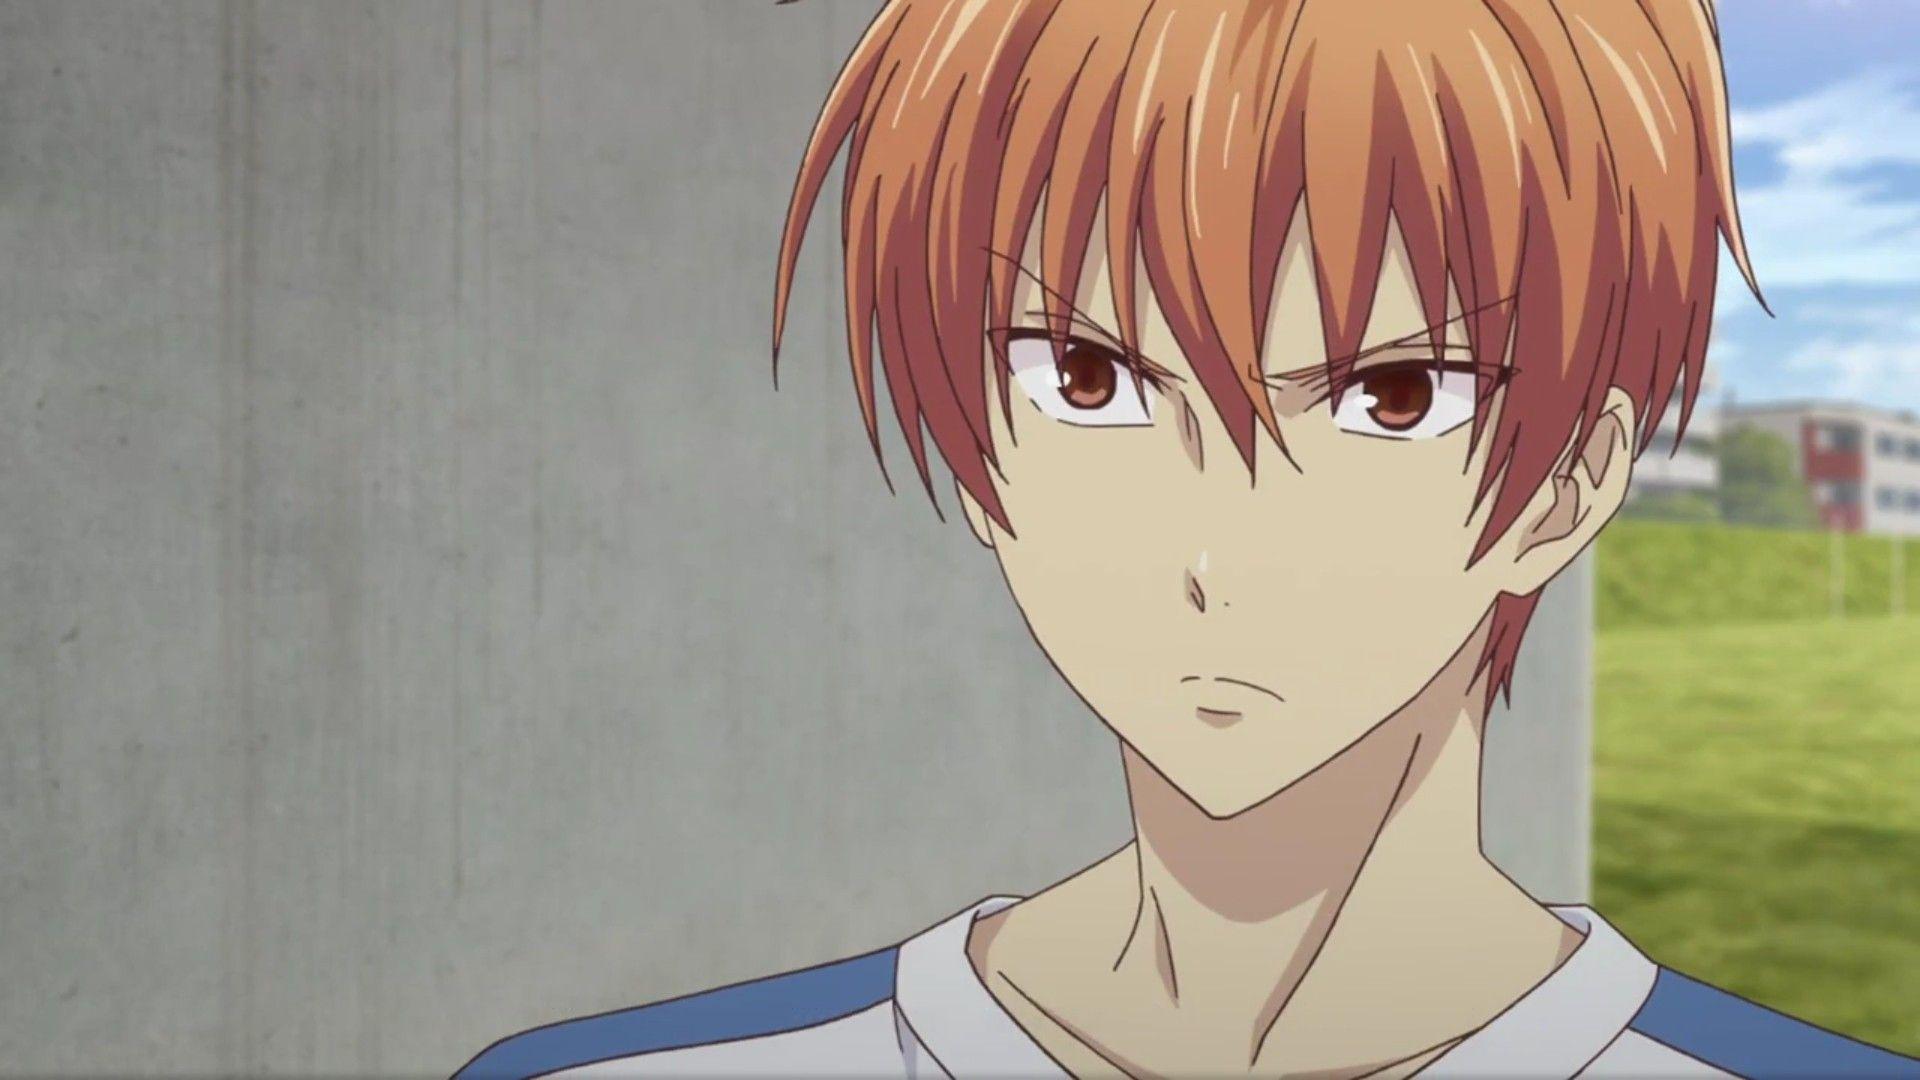 Kyo Sohma Fruits Basket 2019 Anime